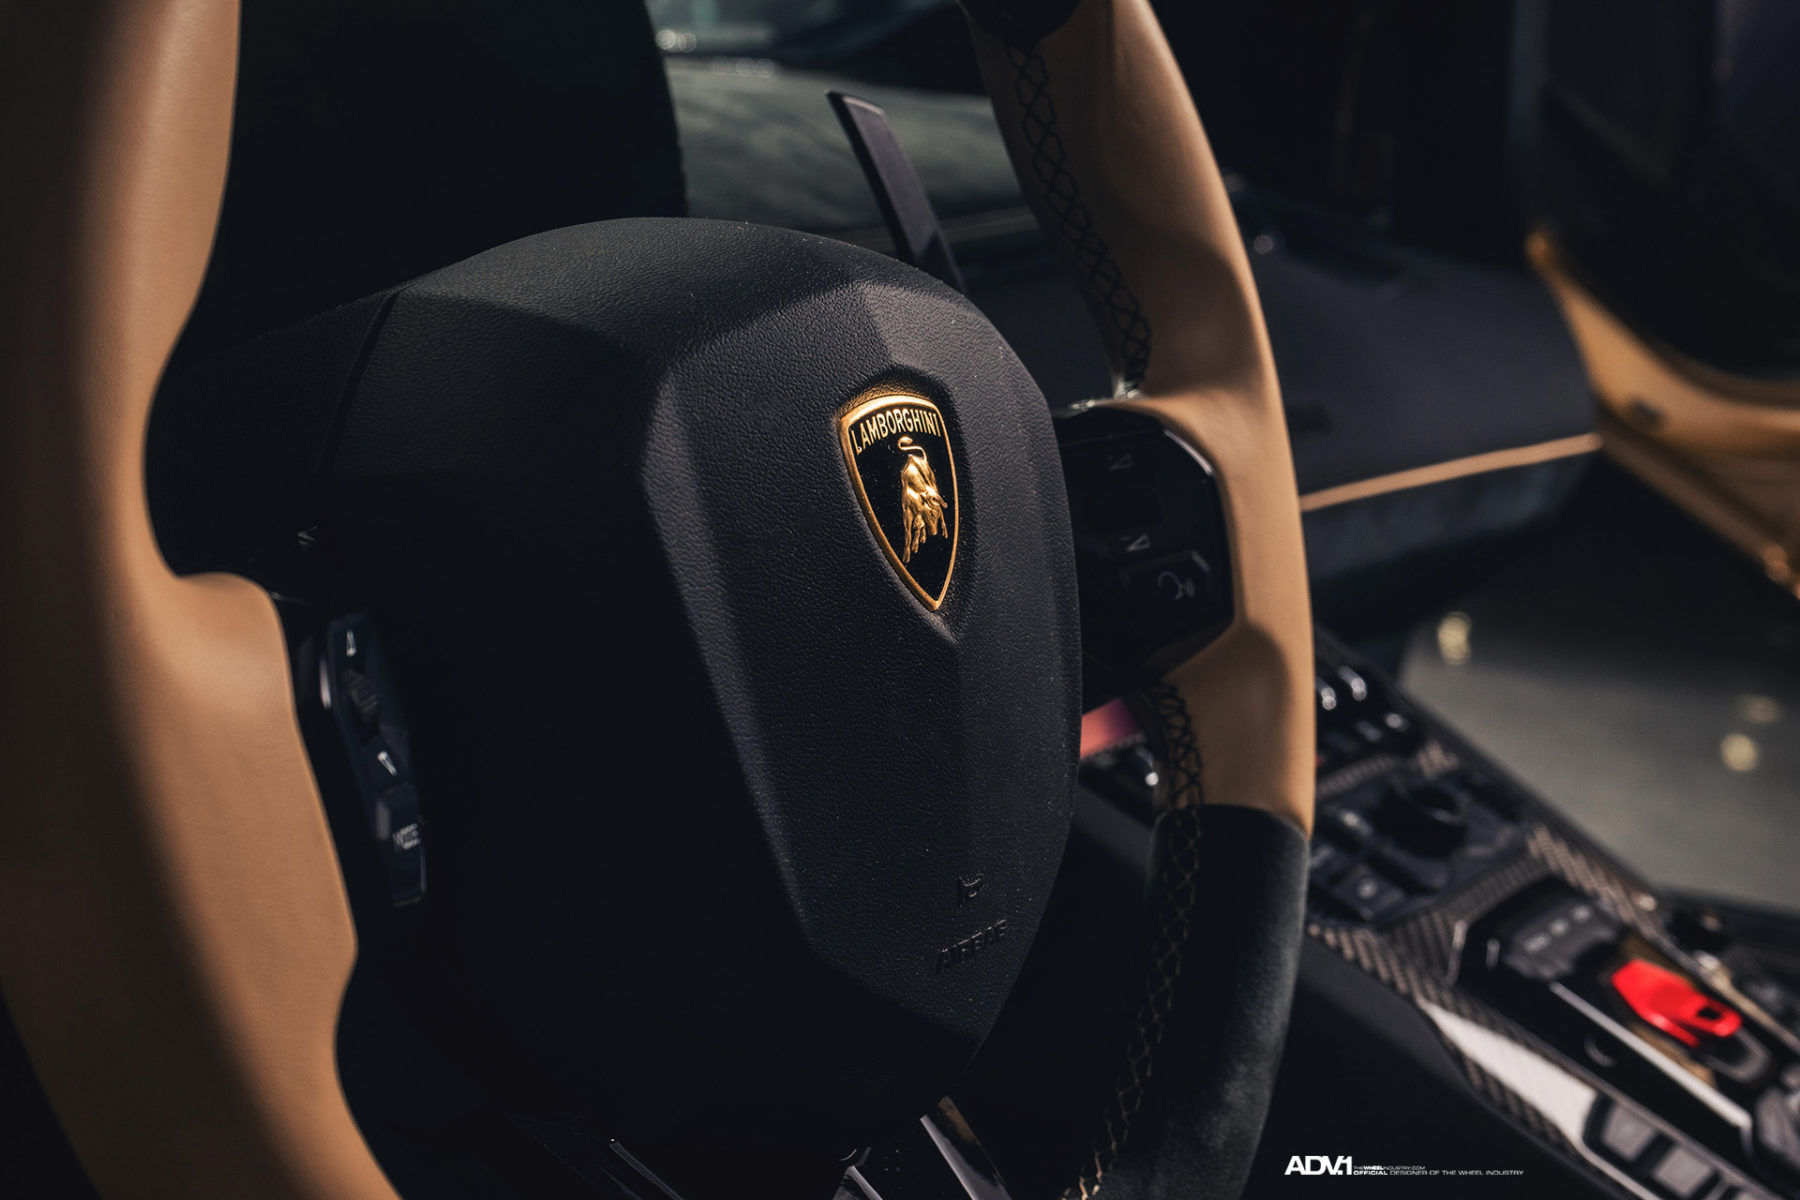 Lamborghini Aventador | Gold Lamborghini Aventador SV Roadster LP750-4 - ADV1 ADV5.3 Track Spec CS Series Centerlock